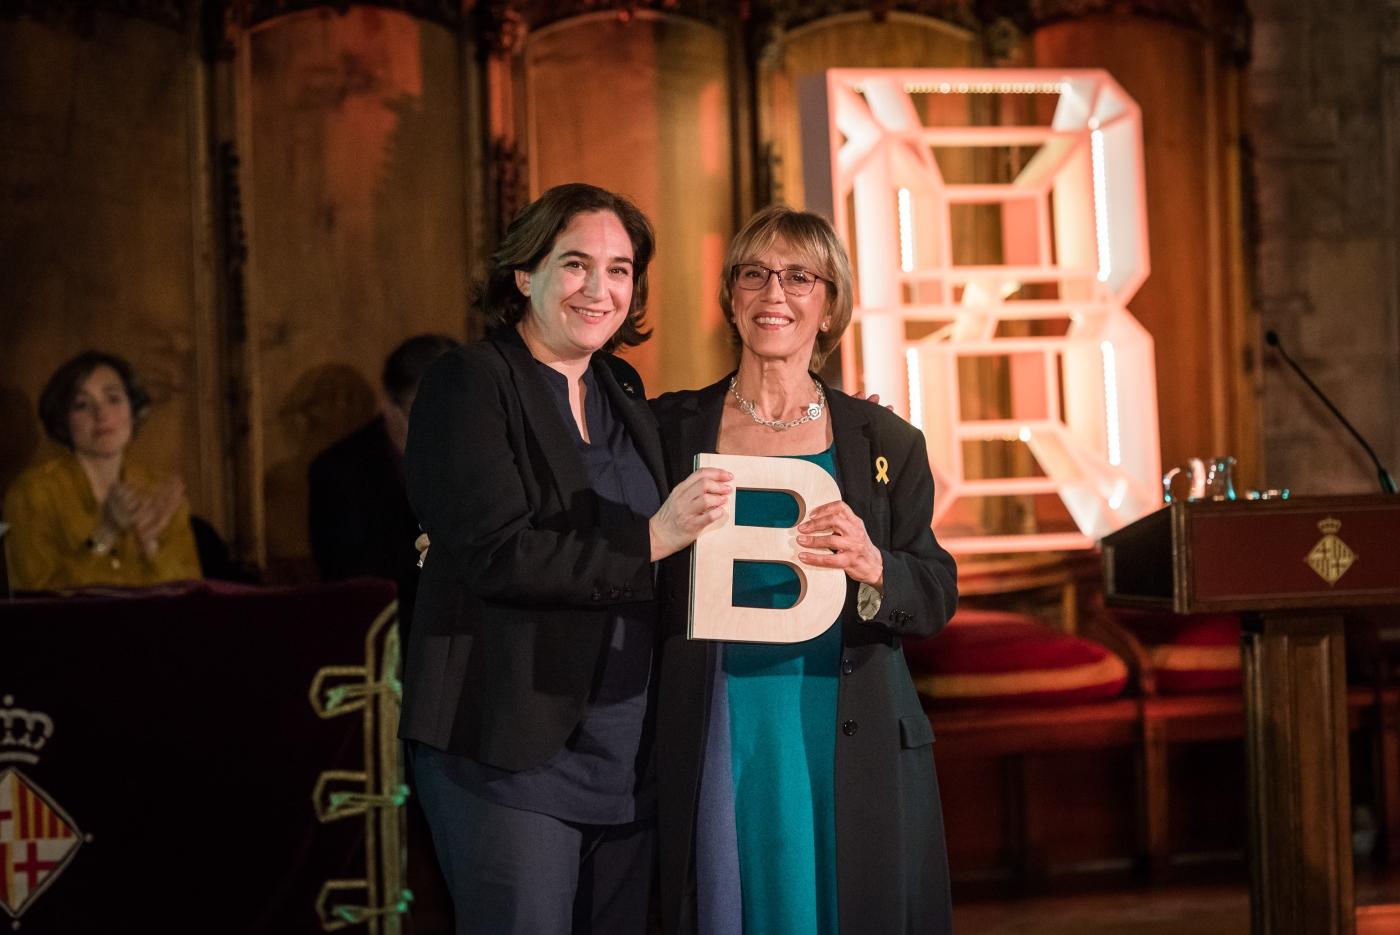 Imma Colomer - Premi Ciutat de Barcelona de Teatre 2017